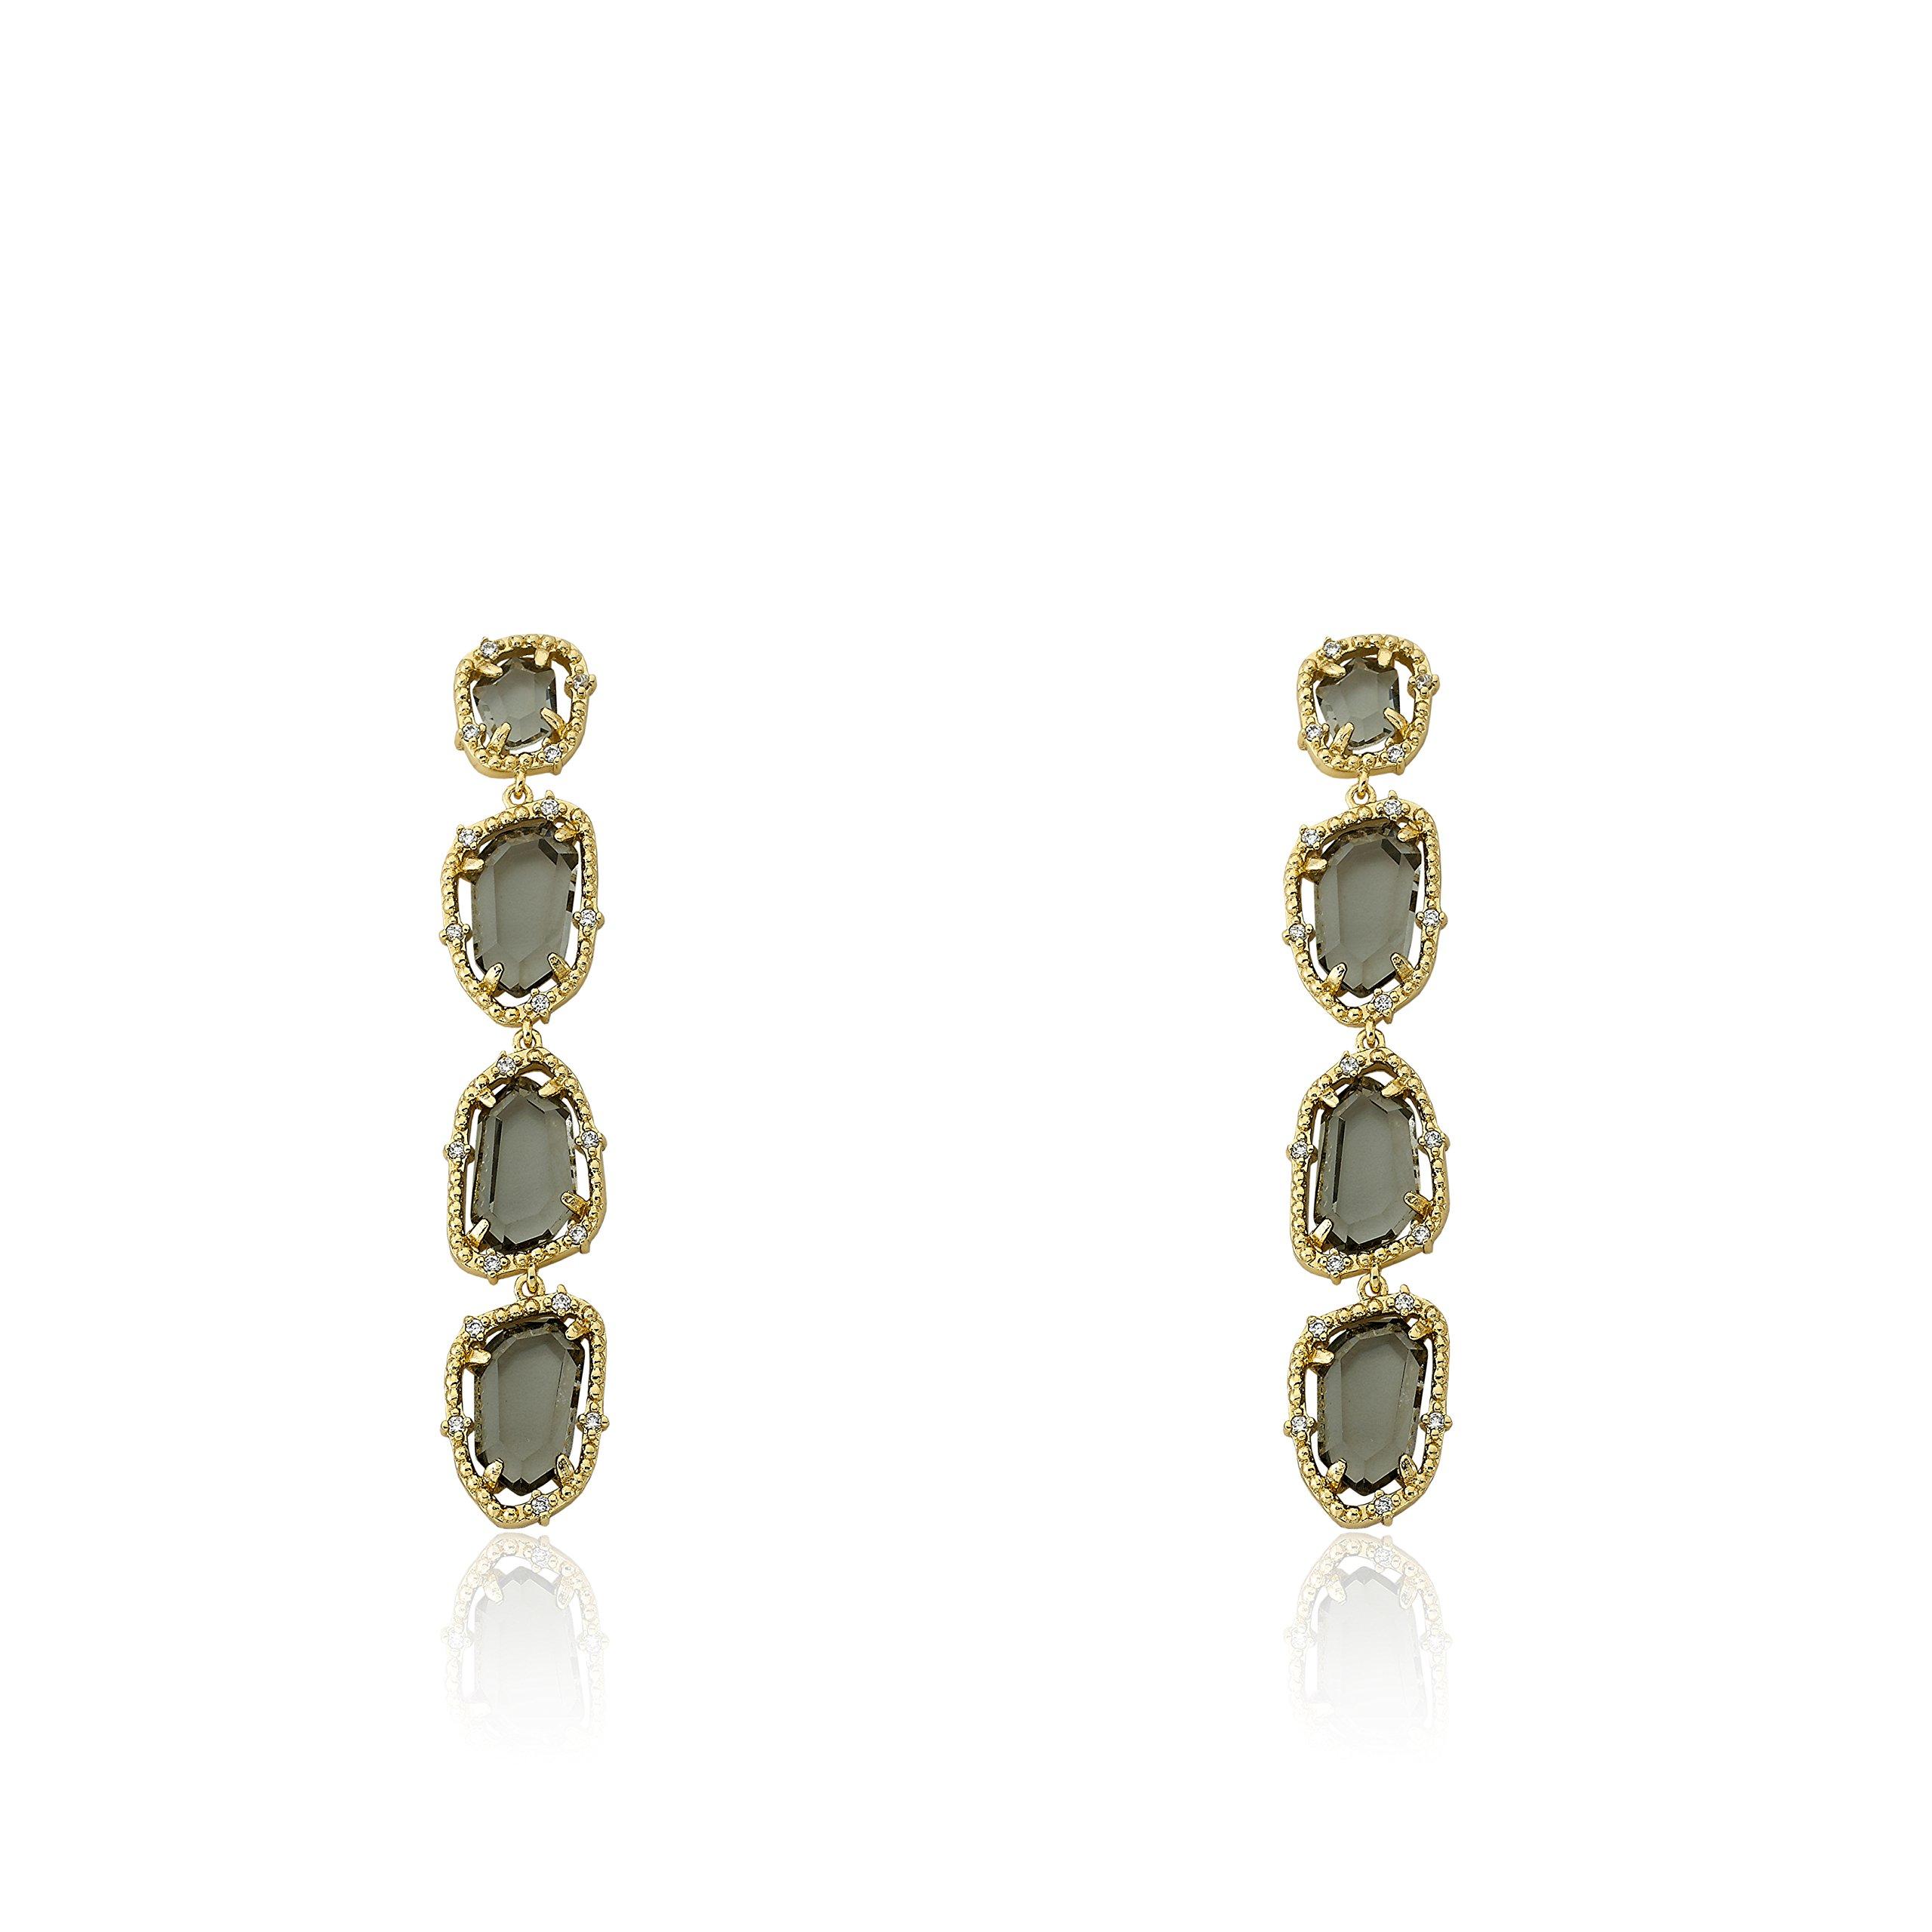 Riccova Sliced Glass 14k Gold-Plated CZ Around Black Sliced Glass Long Dangle Earring/ by Riccova